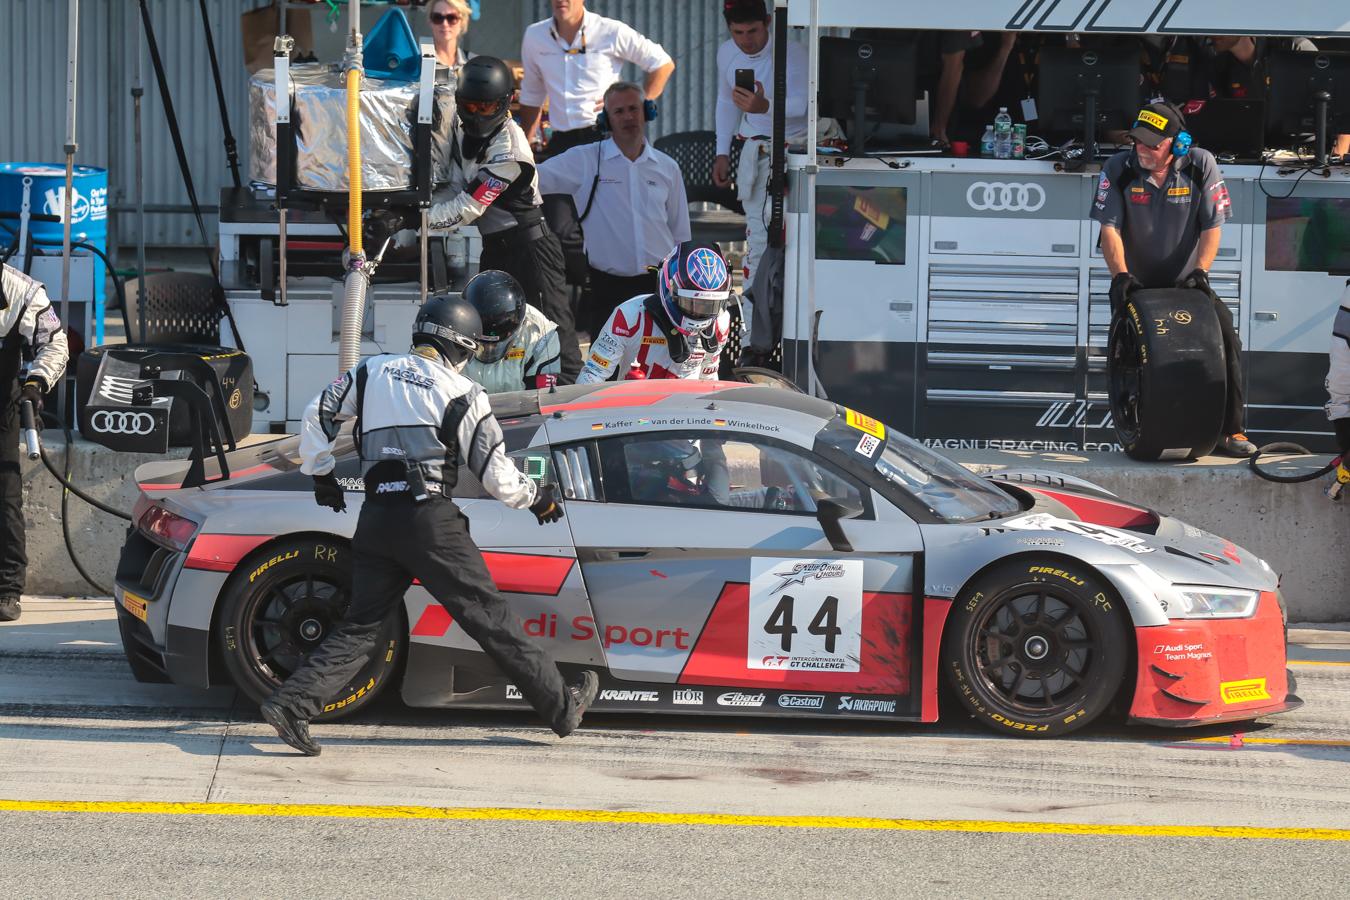 Final Pit Stop for Magnus Audi.